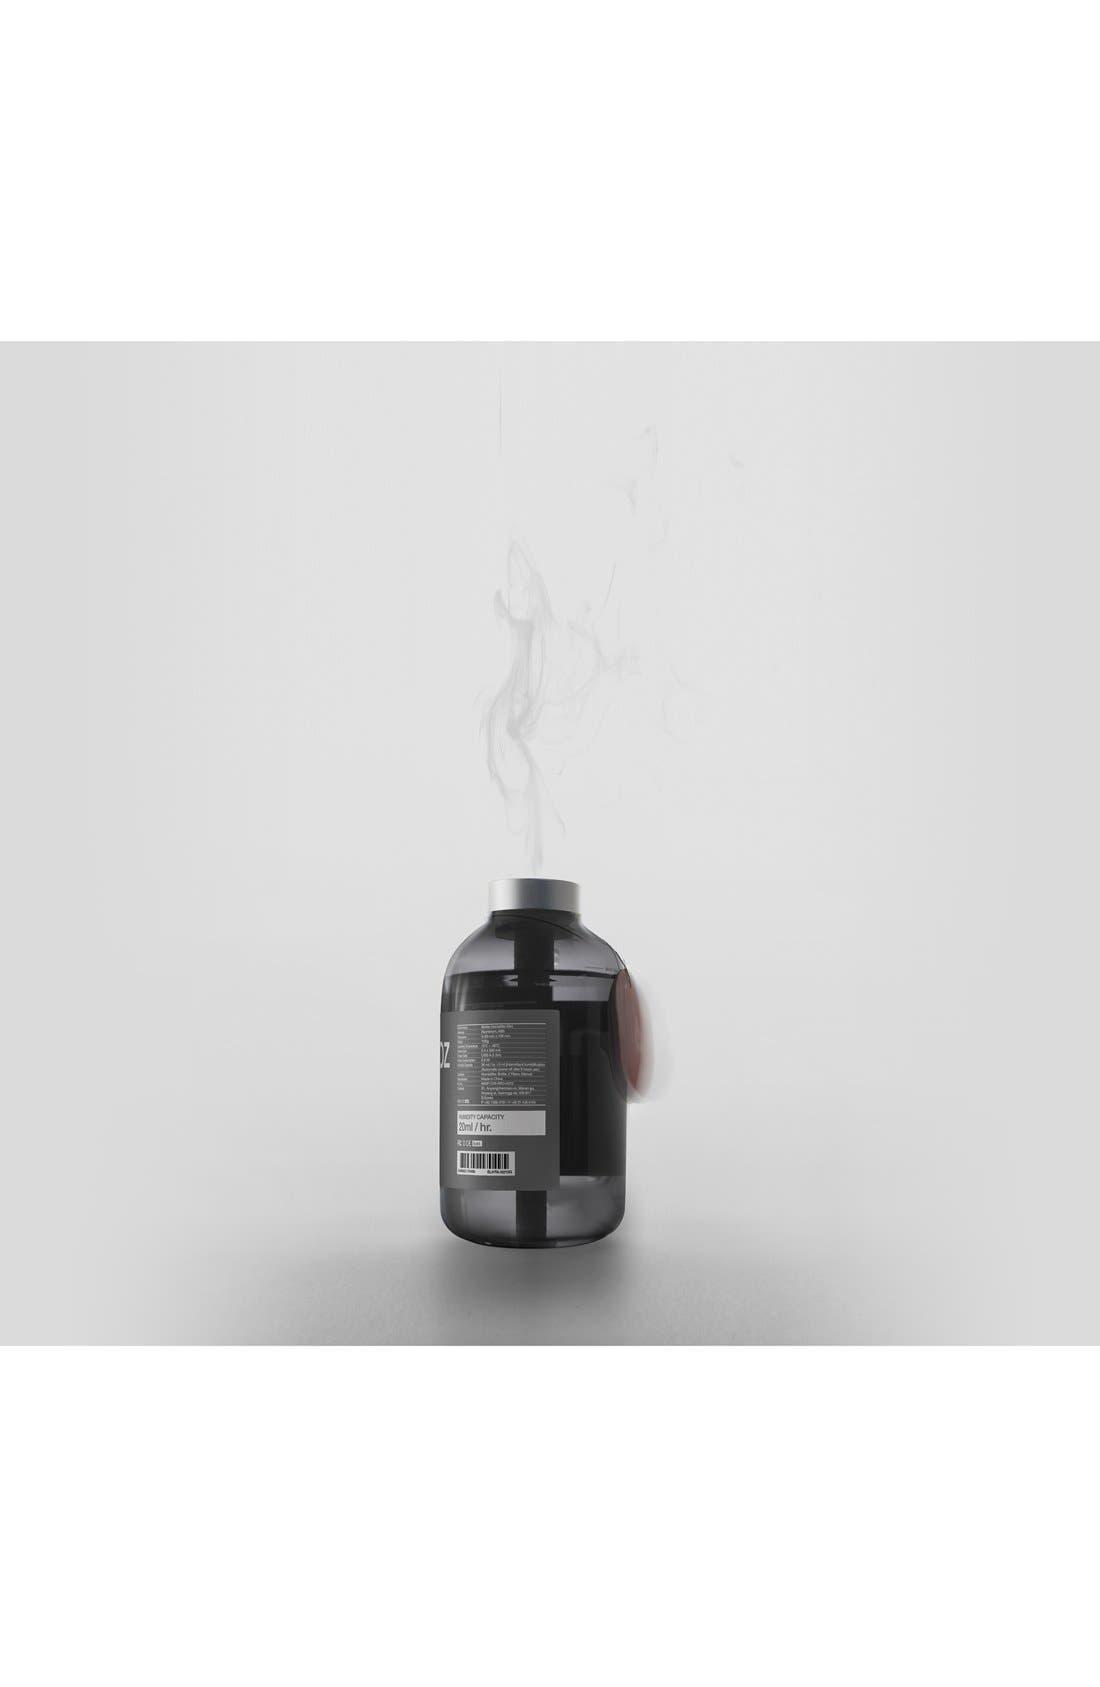 '11+ Bottle Humidifier Mini' USB Travel Humidifier,                             Alternate thumbnail 3, color,                             001